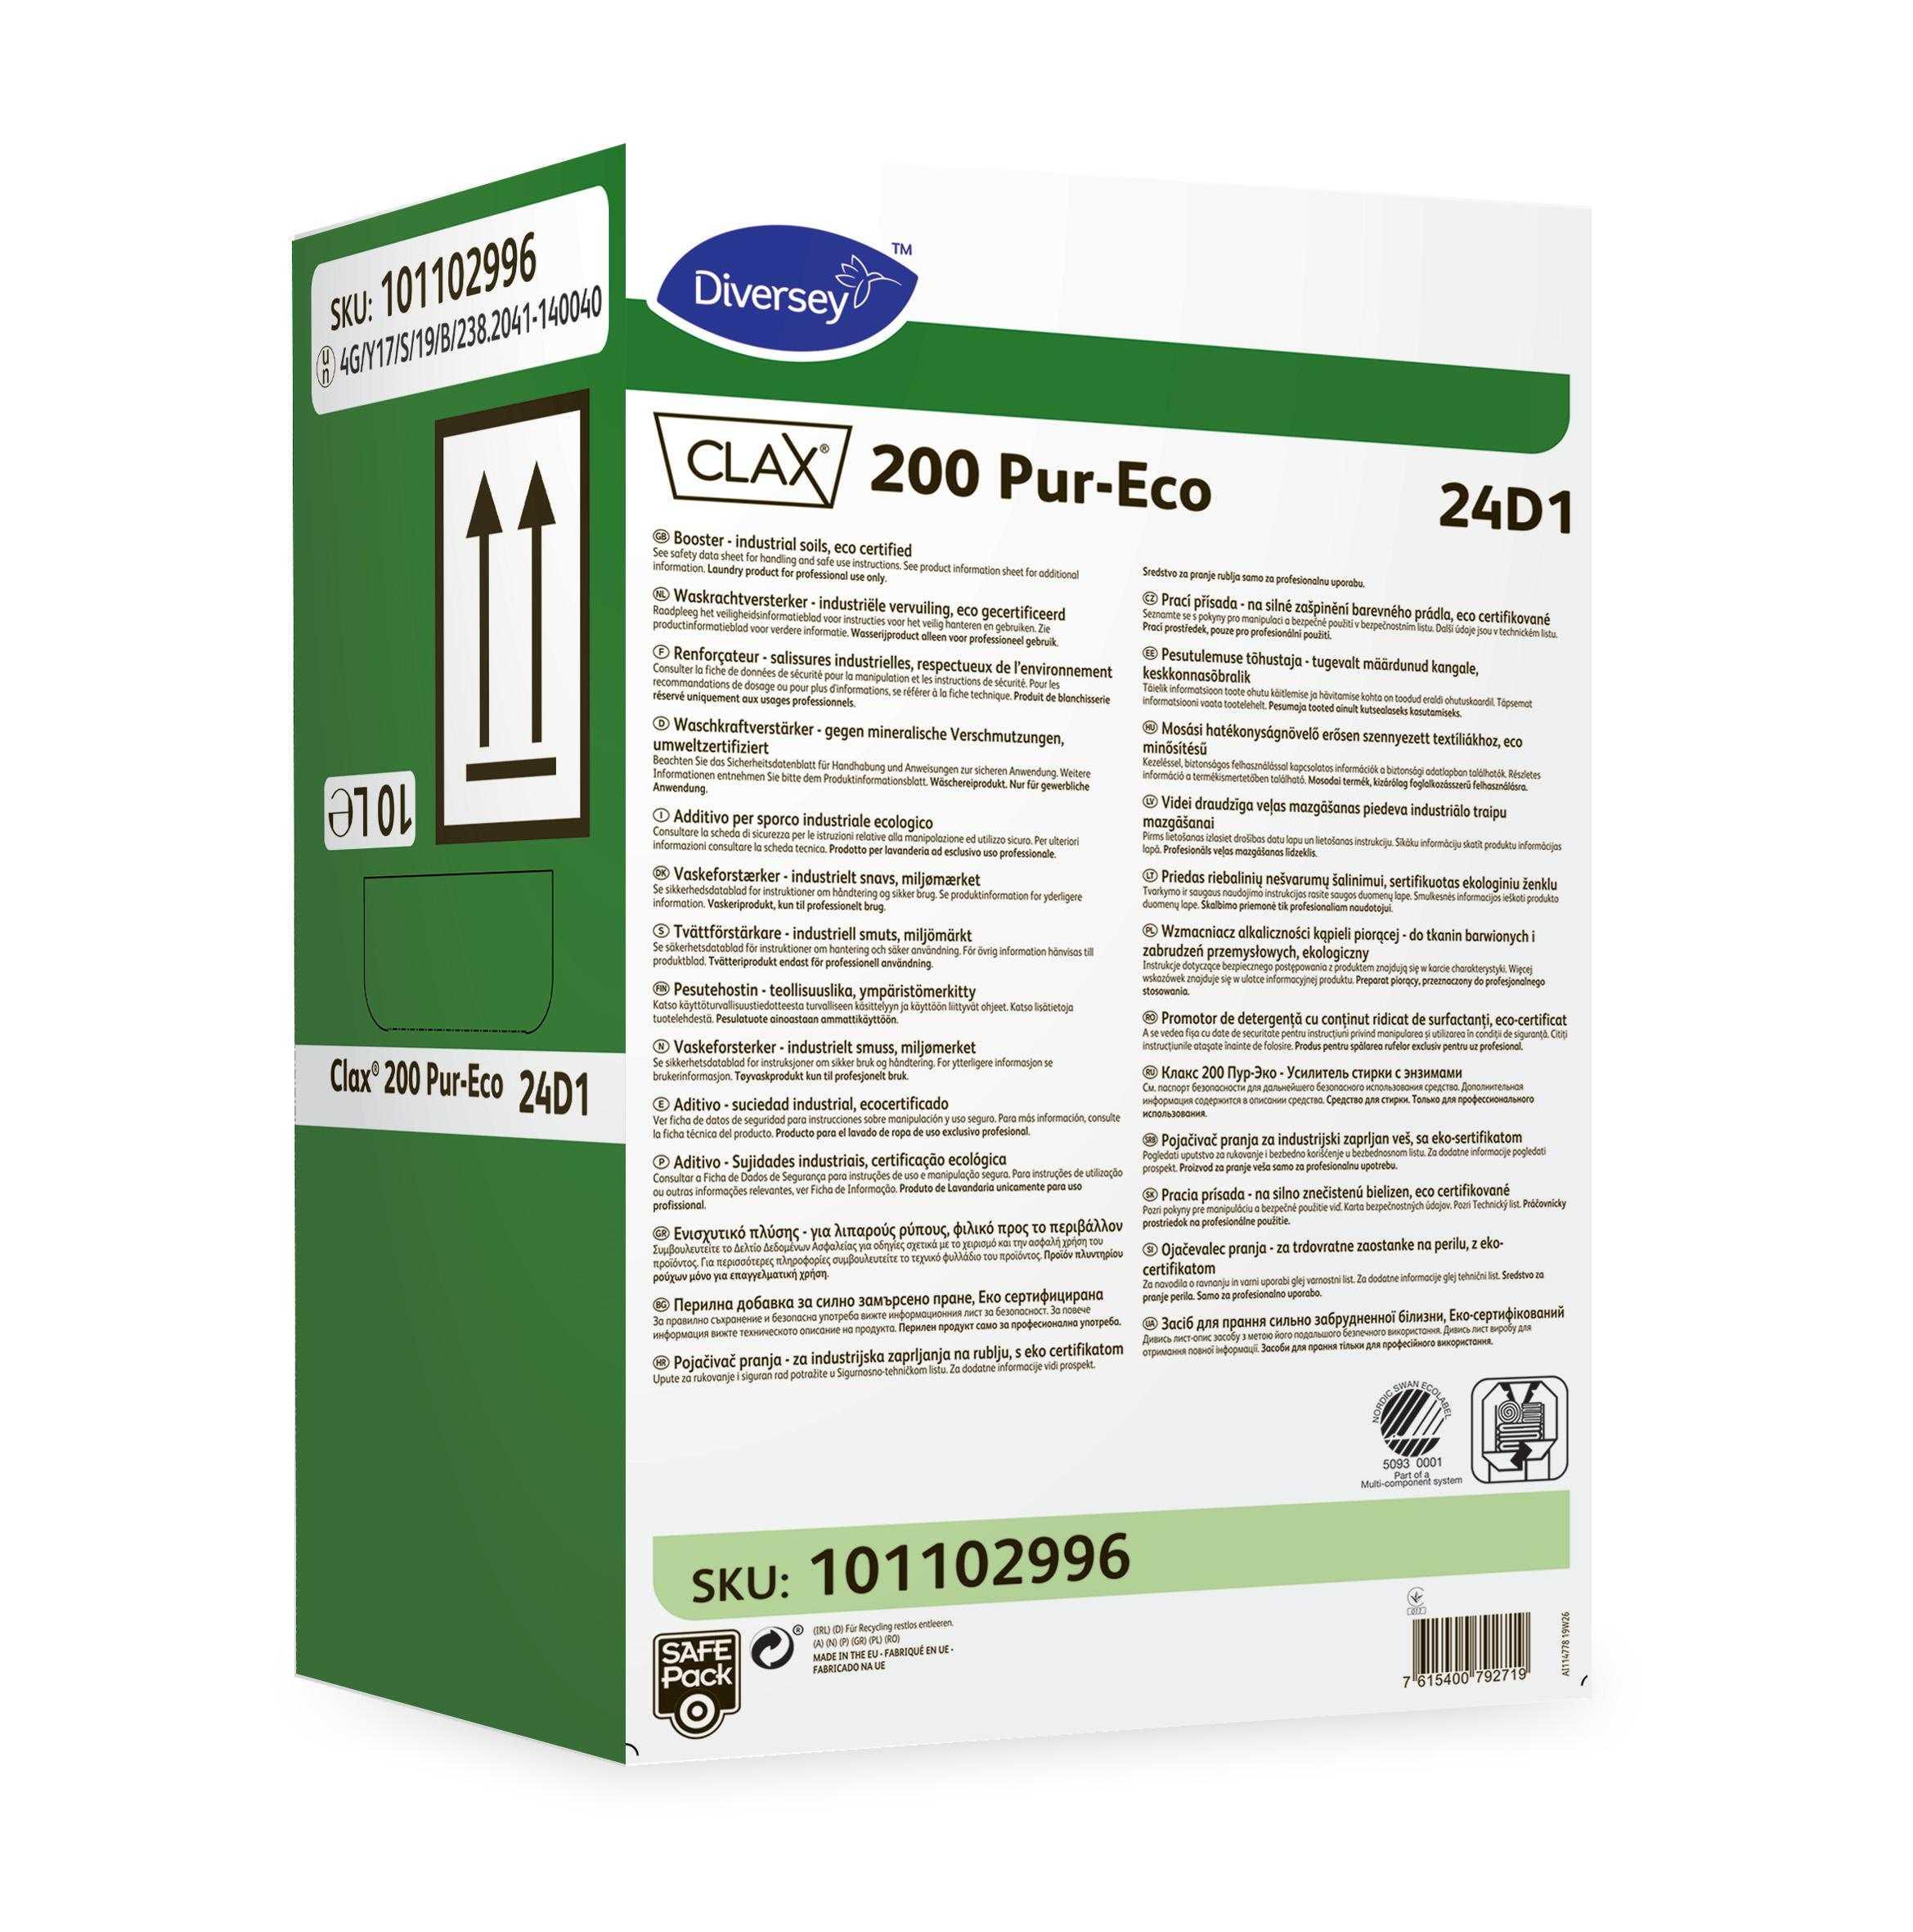 101102996-Clax-200-Pur-Eco-10L-SafePack-20x20cm.jpg